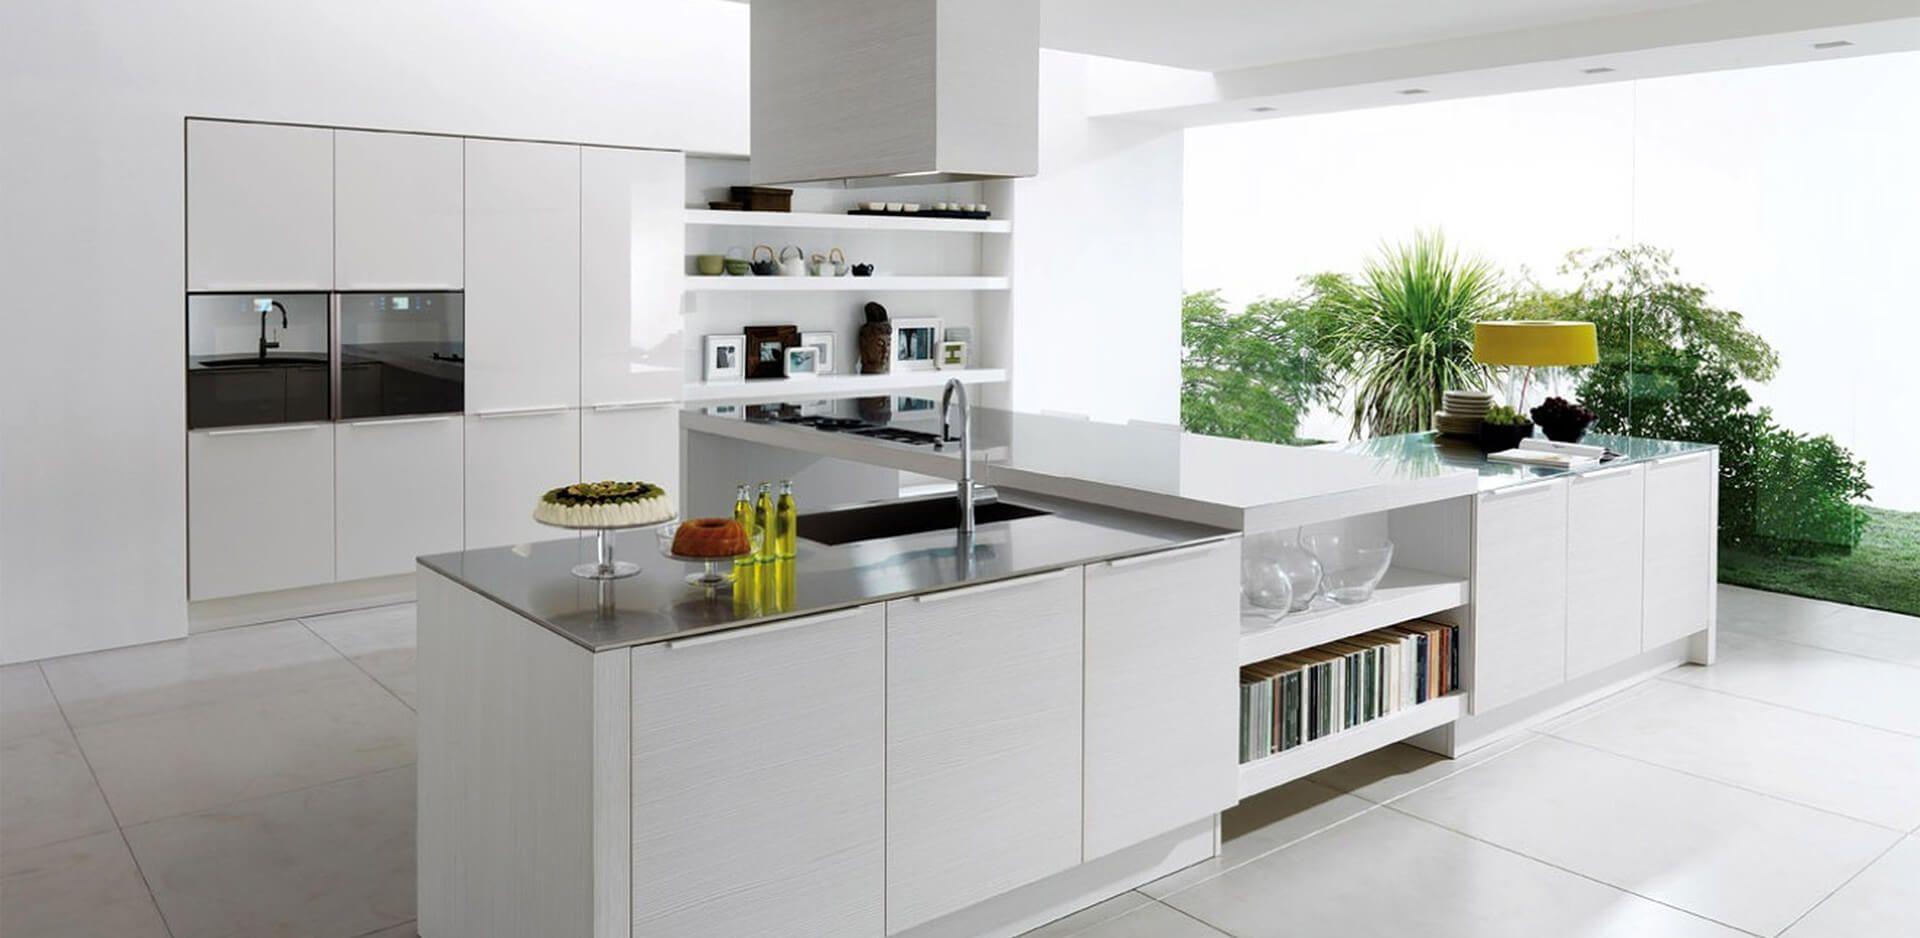 Best European Kitchen Design For You In 2018 And Beyond Modern White Kitchen Cabinets White Modern Kitchen Modern Kitchen Island